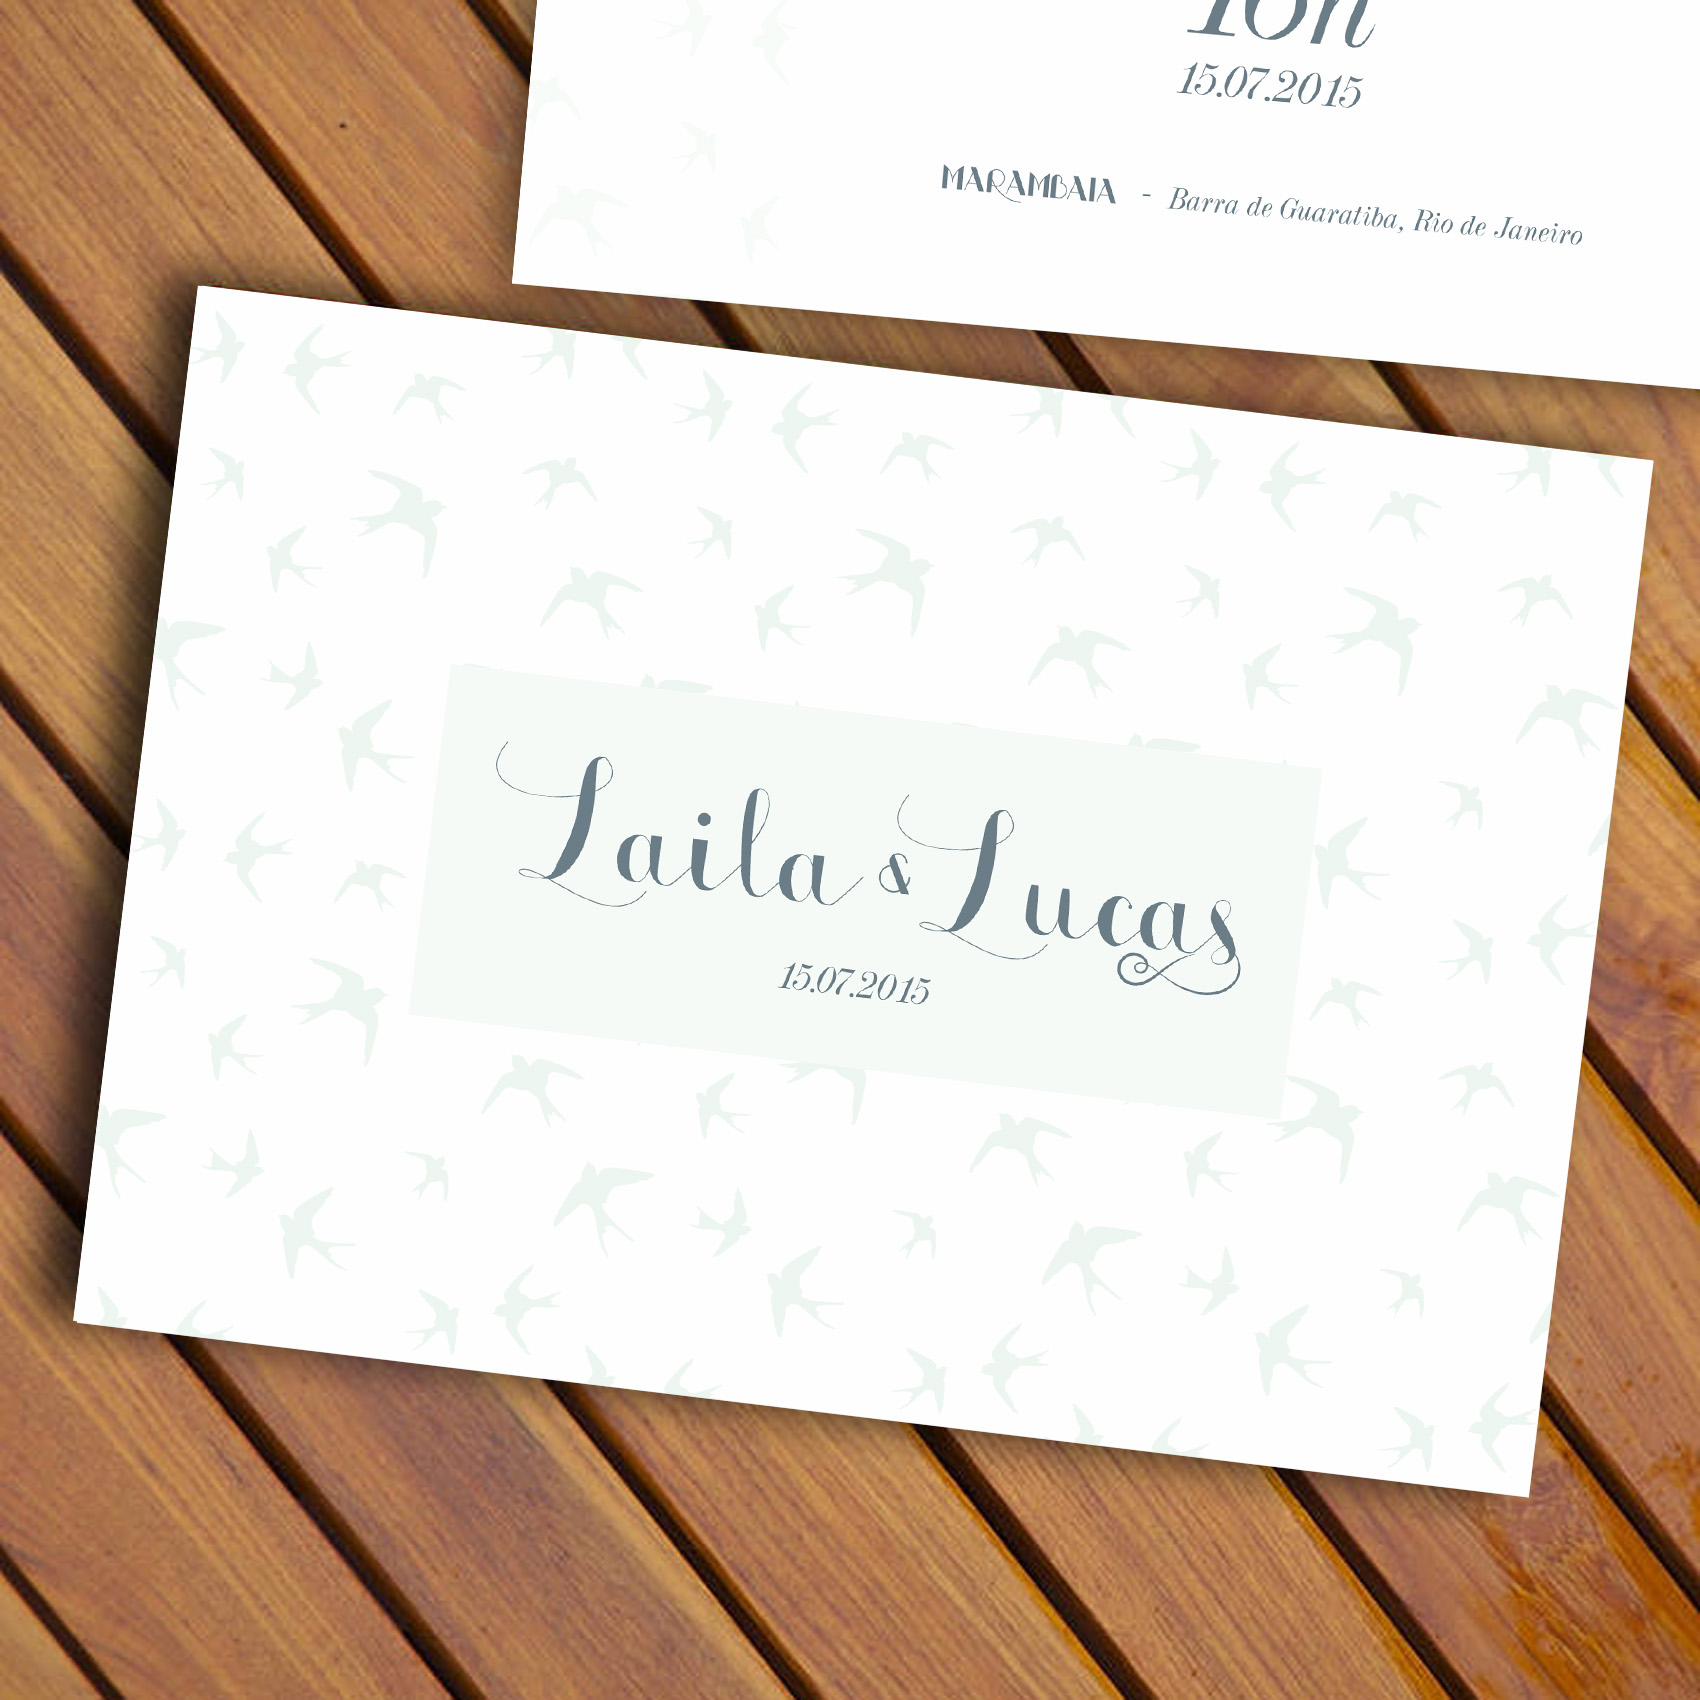 6d181c218 Convite de Casamento Ar Livre (frente e verso) – Papel e Letra ...